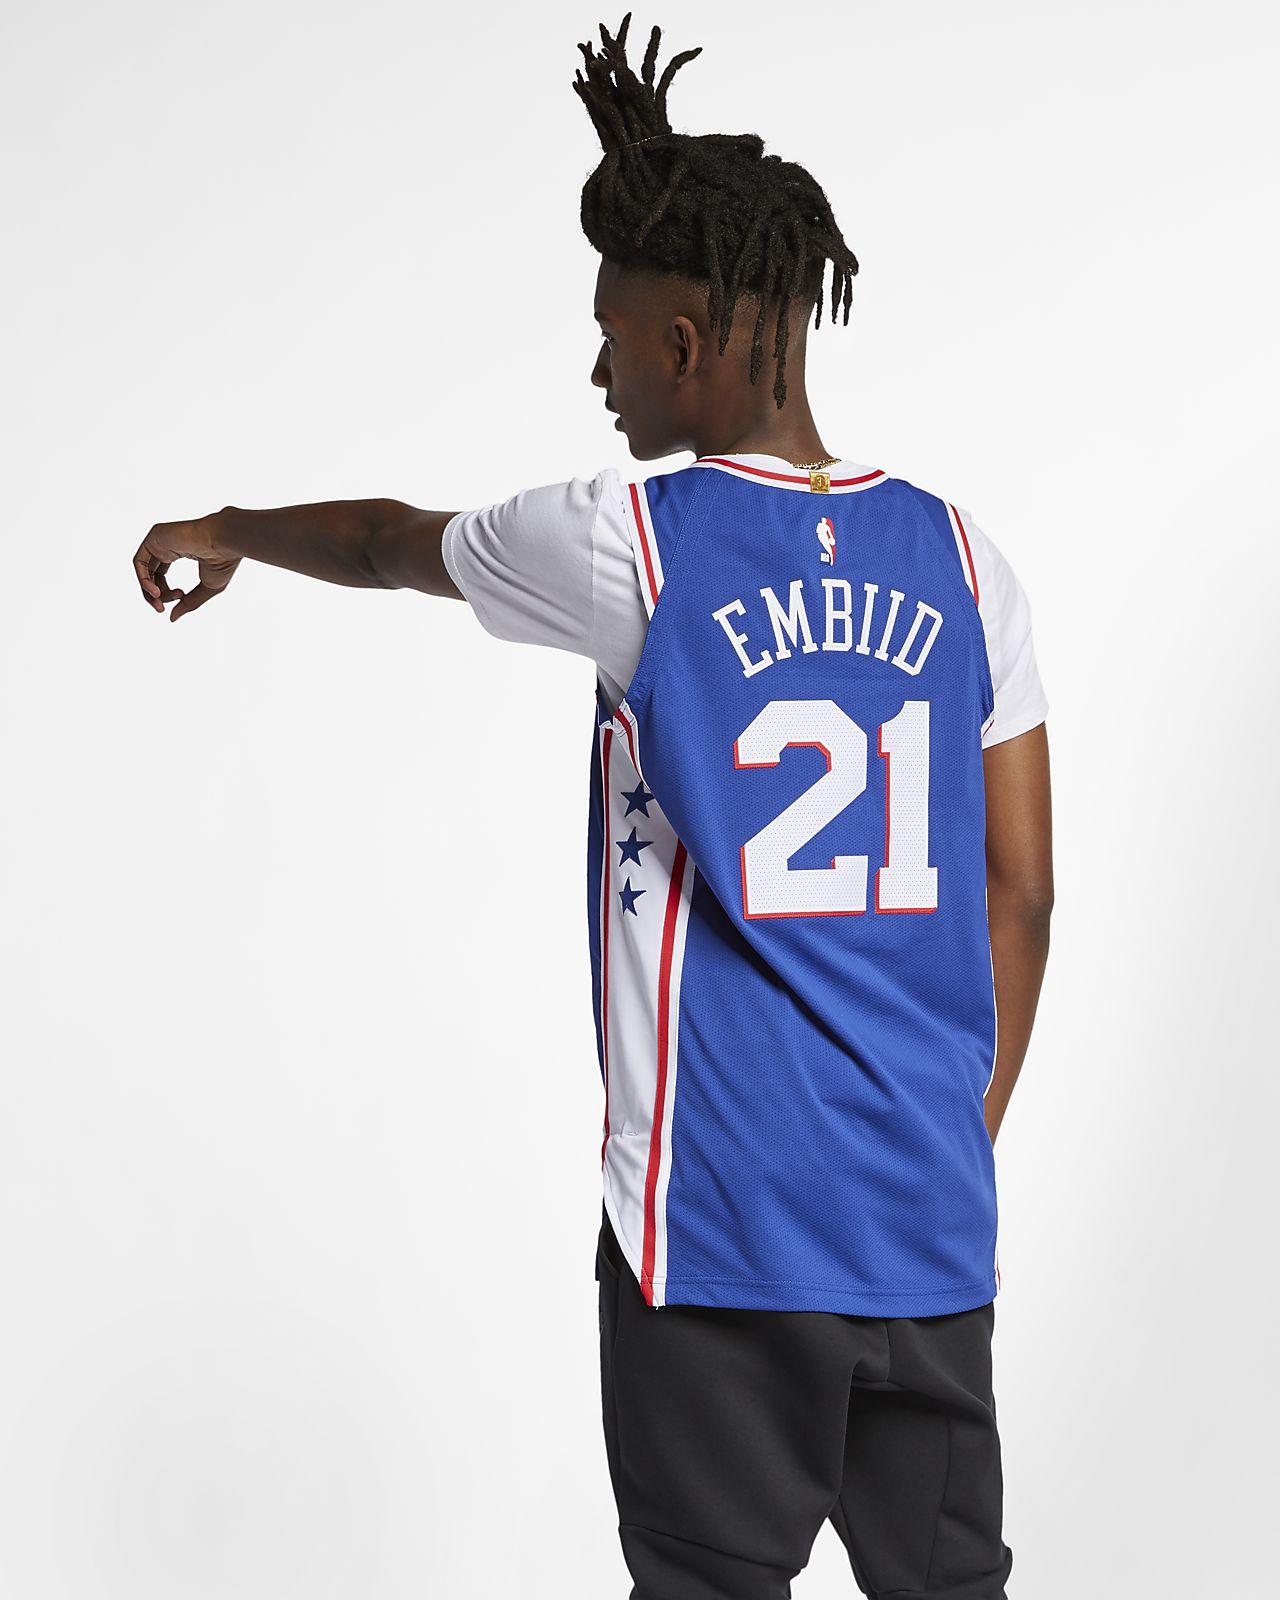 d4dc70deb75 ... Joel Embiid Icon Edition Authentic (Philadelphia 76ers) Men's Nike NBA  Connected Jersey